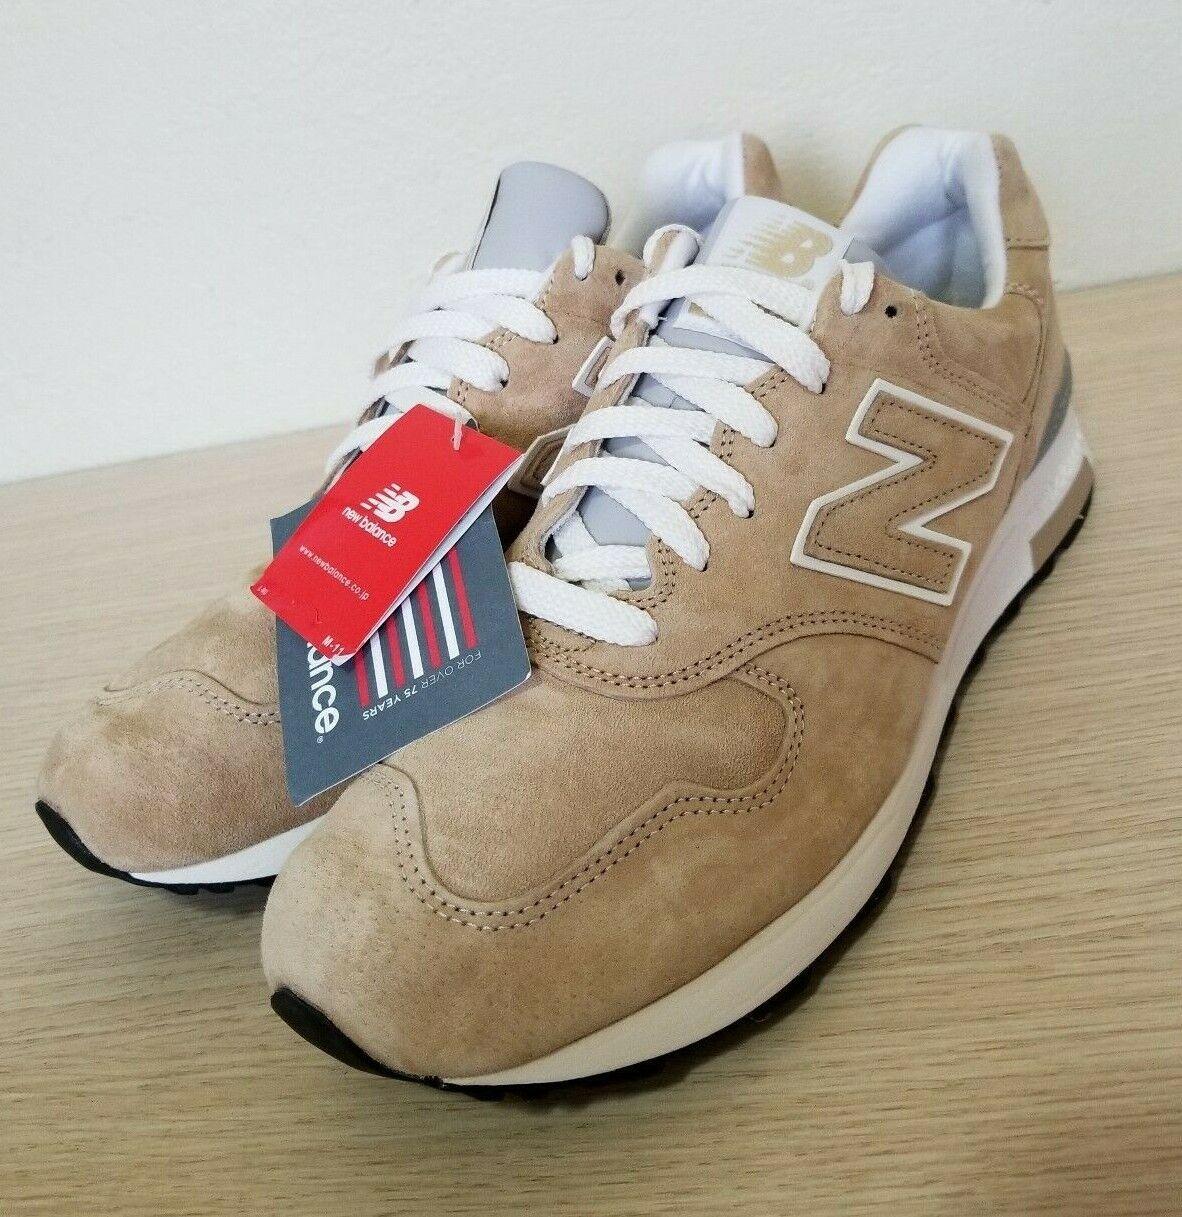 New Balance 1400 Classic Running Shoes